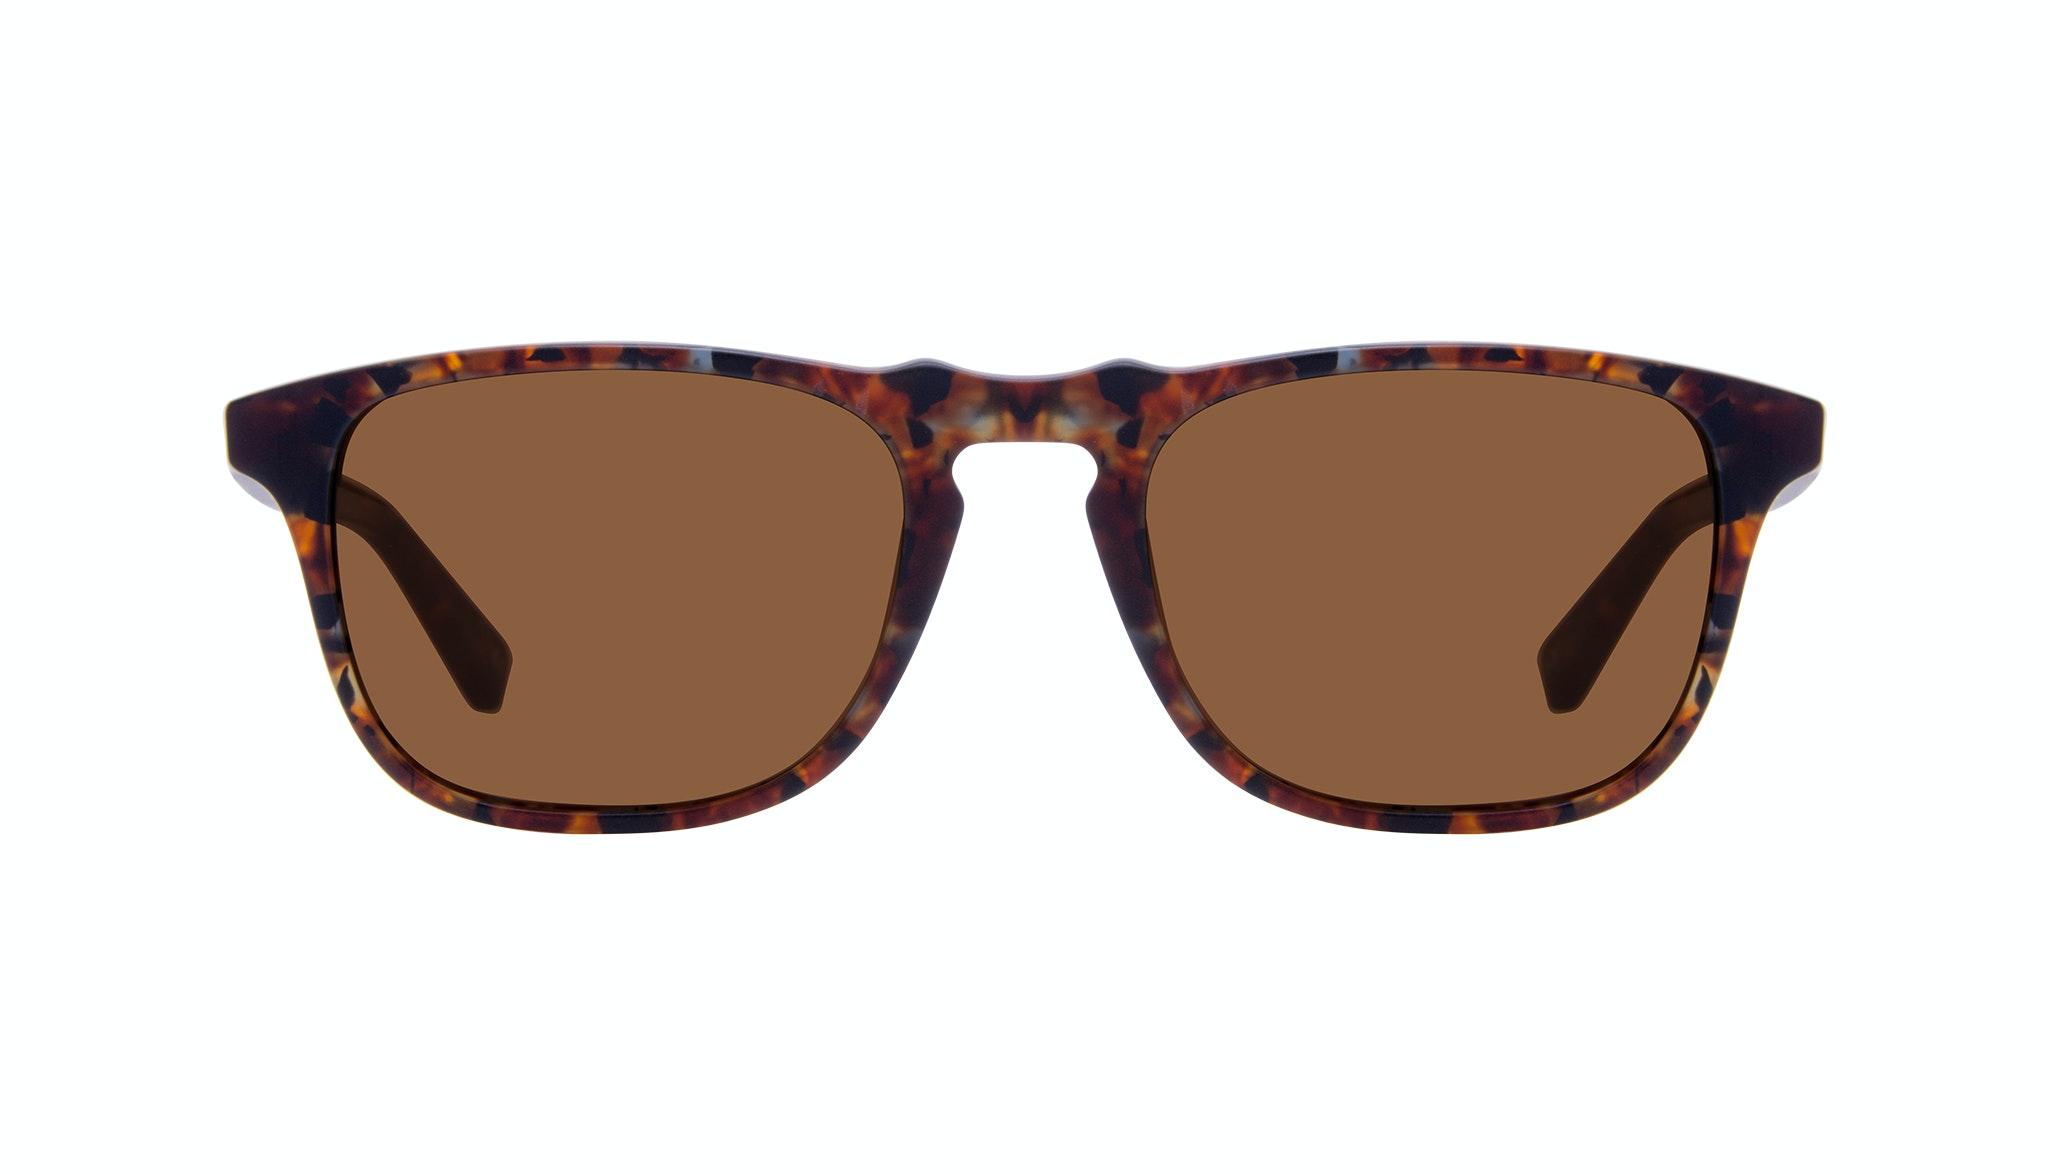 Affordable Fashion Glasses Rectangle Sunglasses Men Dare Mahogany Front